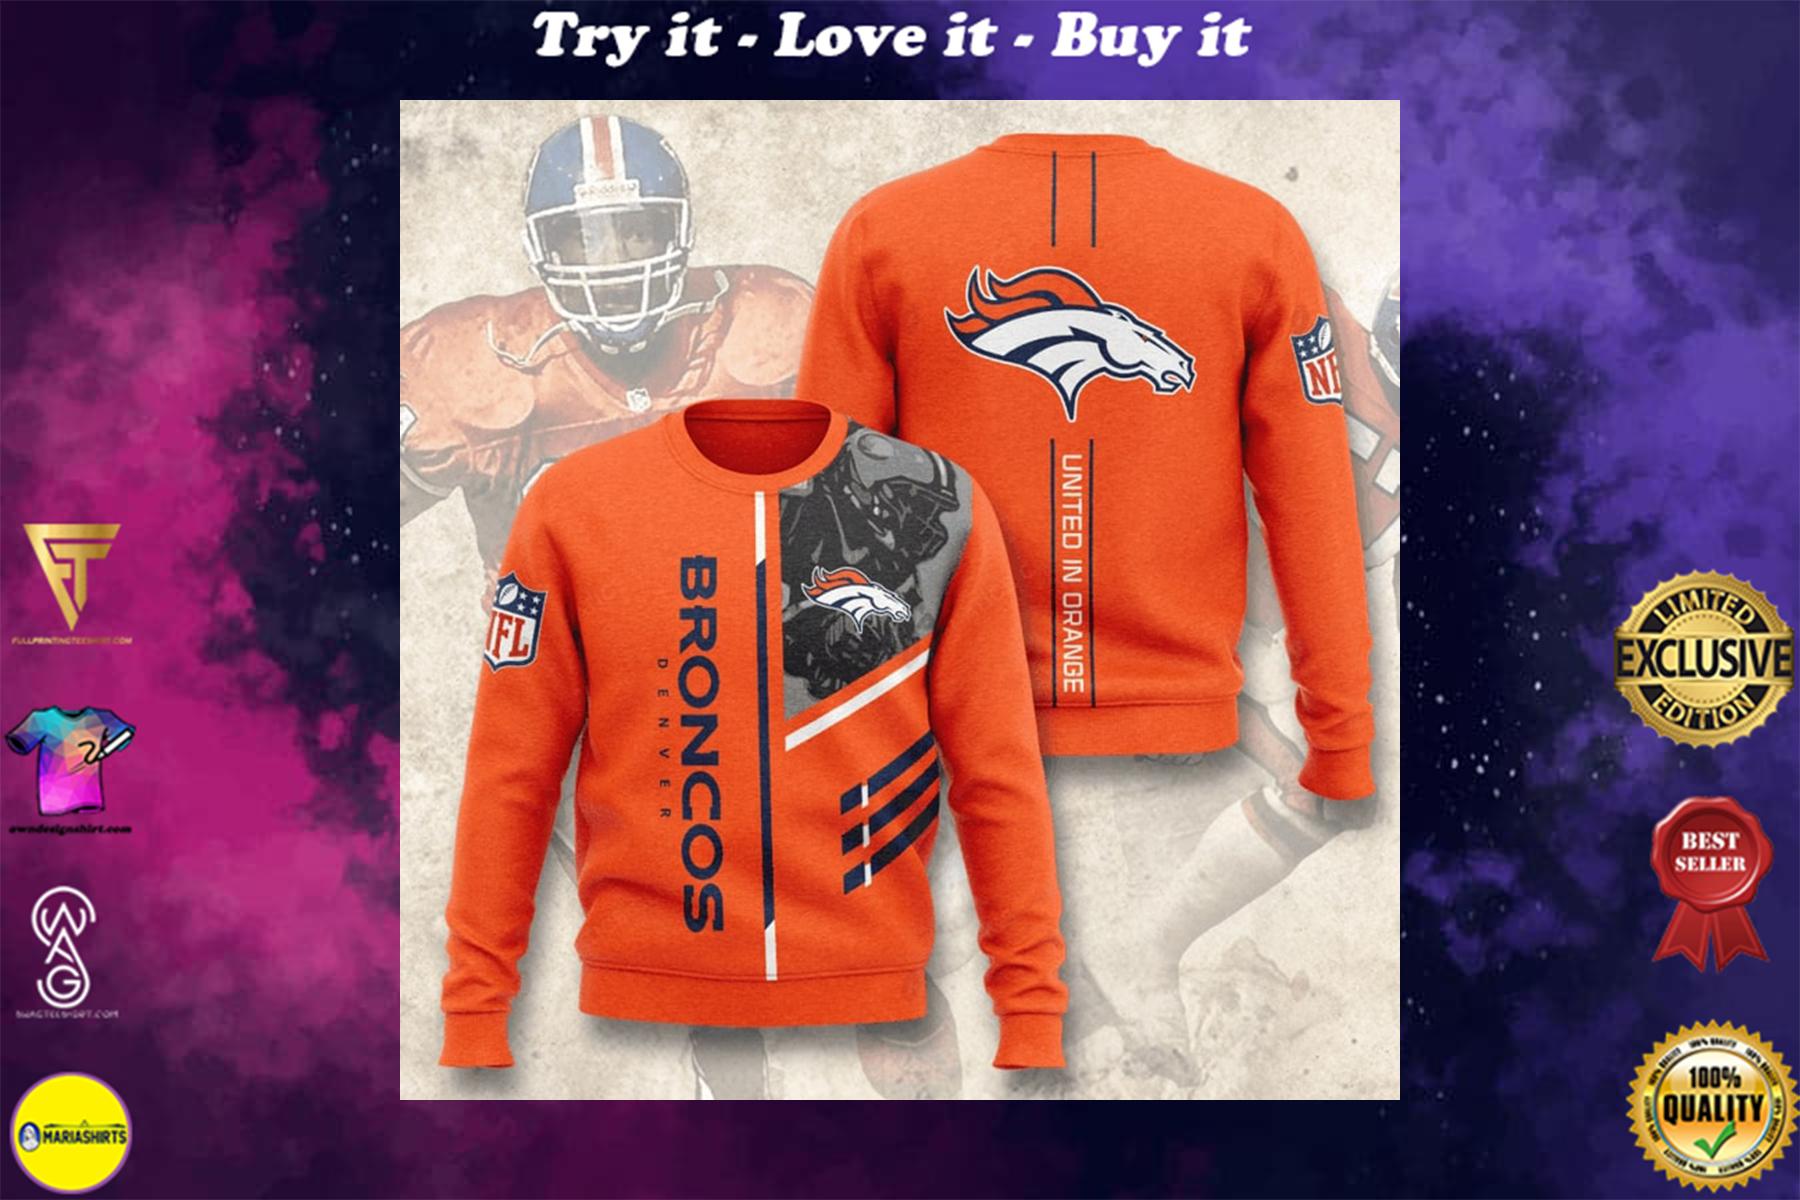 [highest selling] denver broncos united in orange full printing ugly sweater - maria